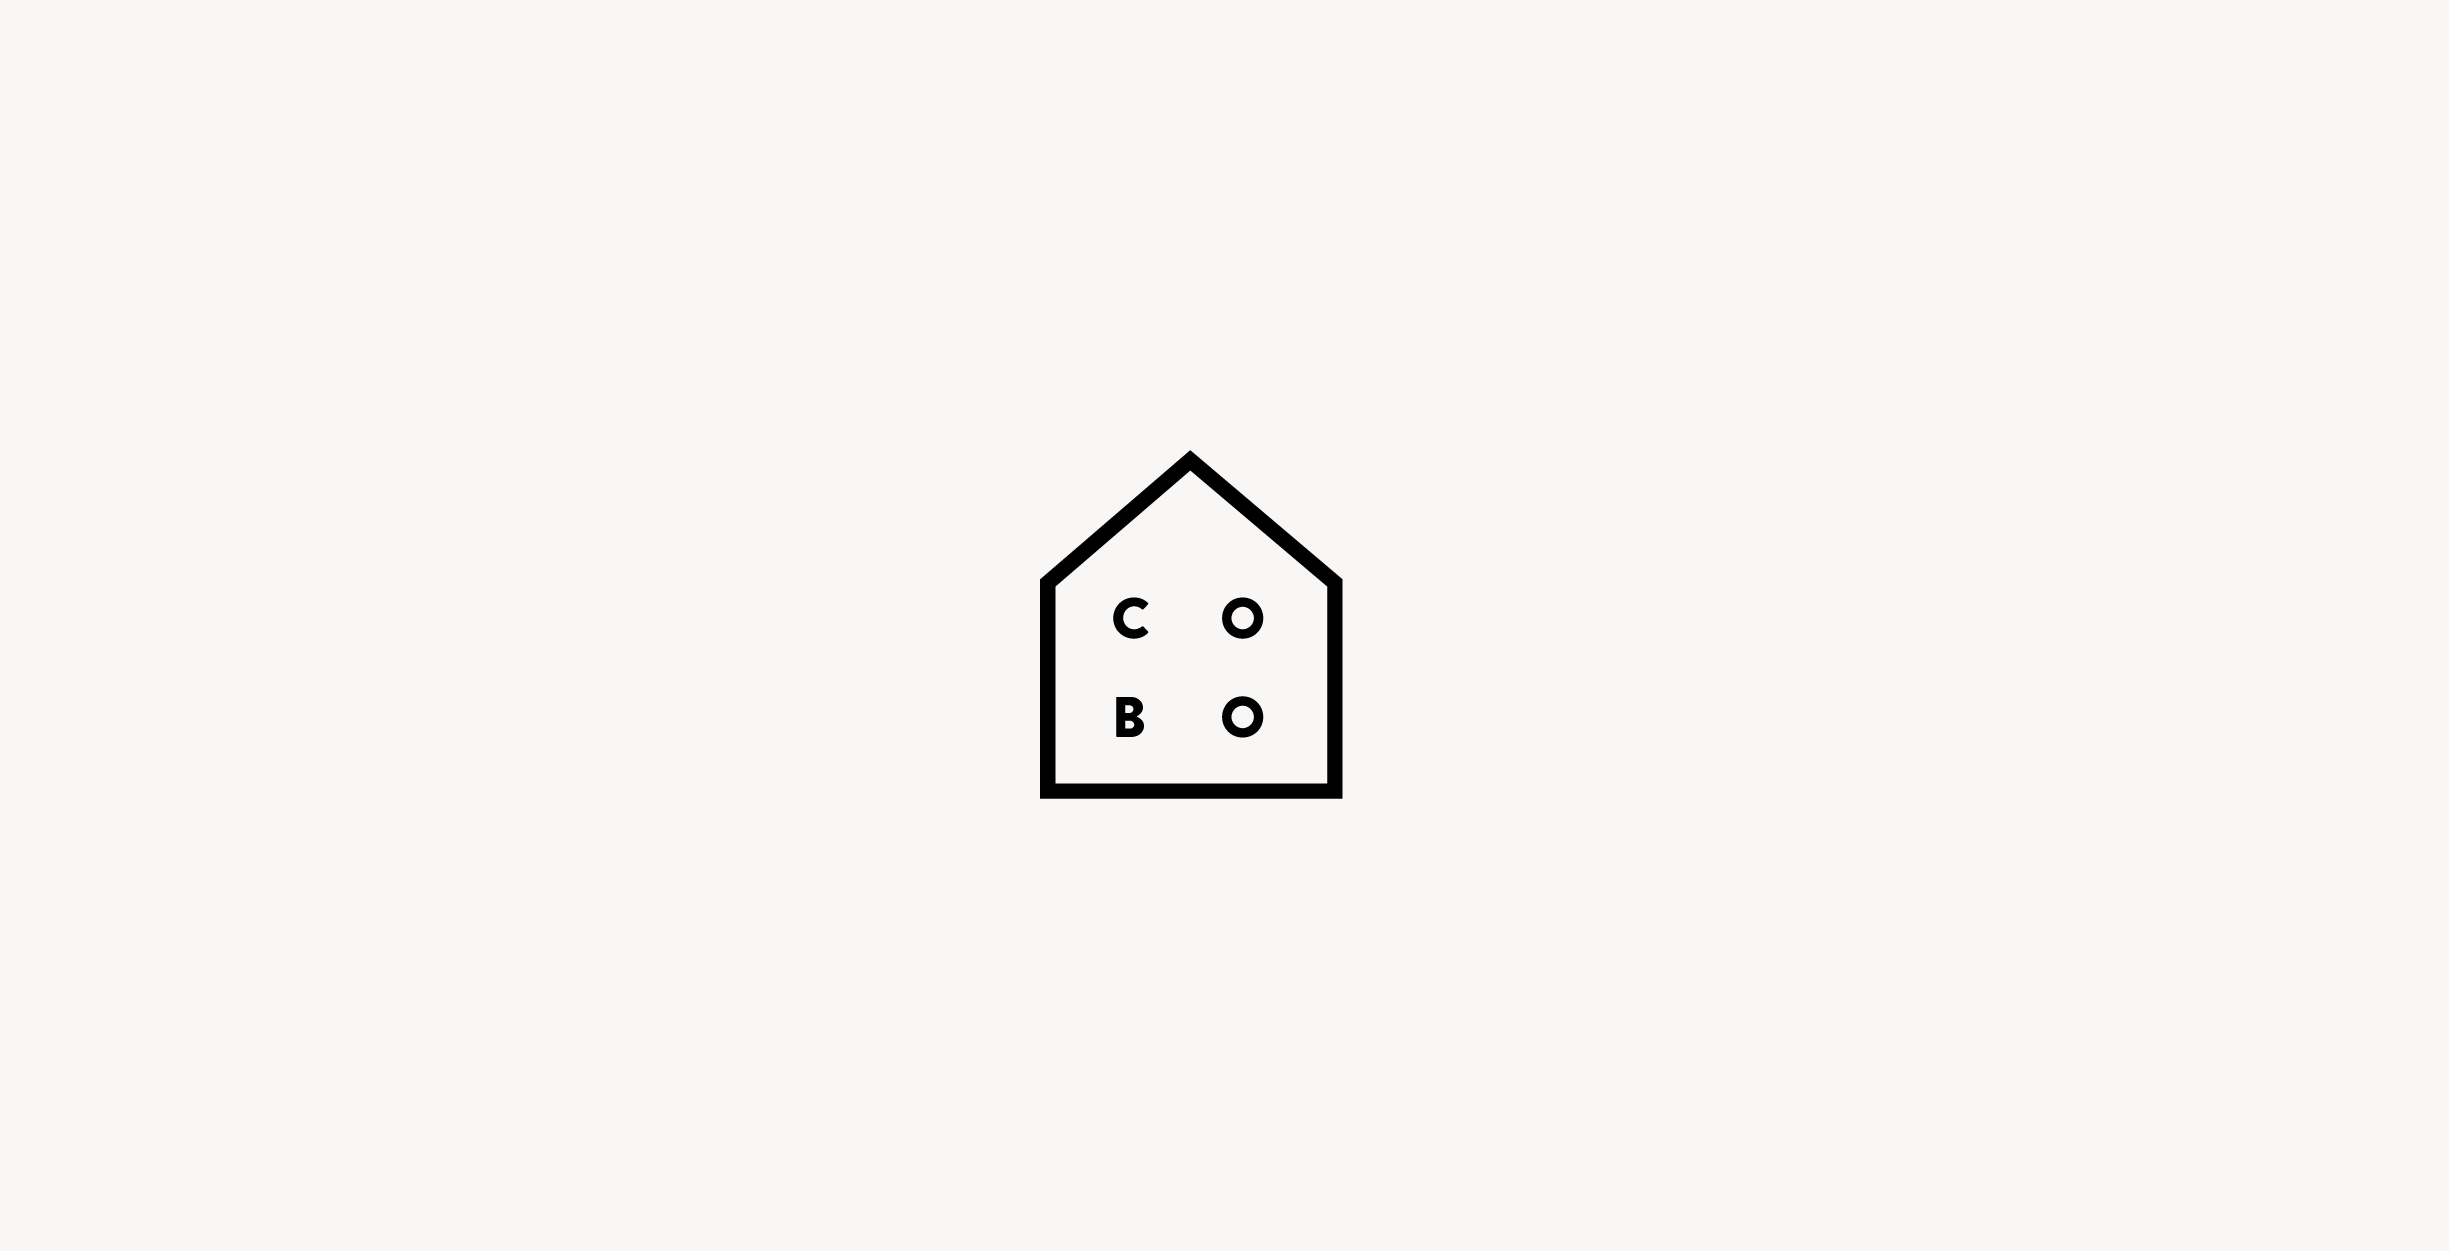 logos-2-v4-03